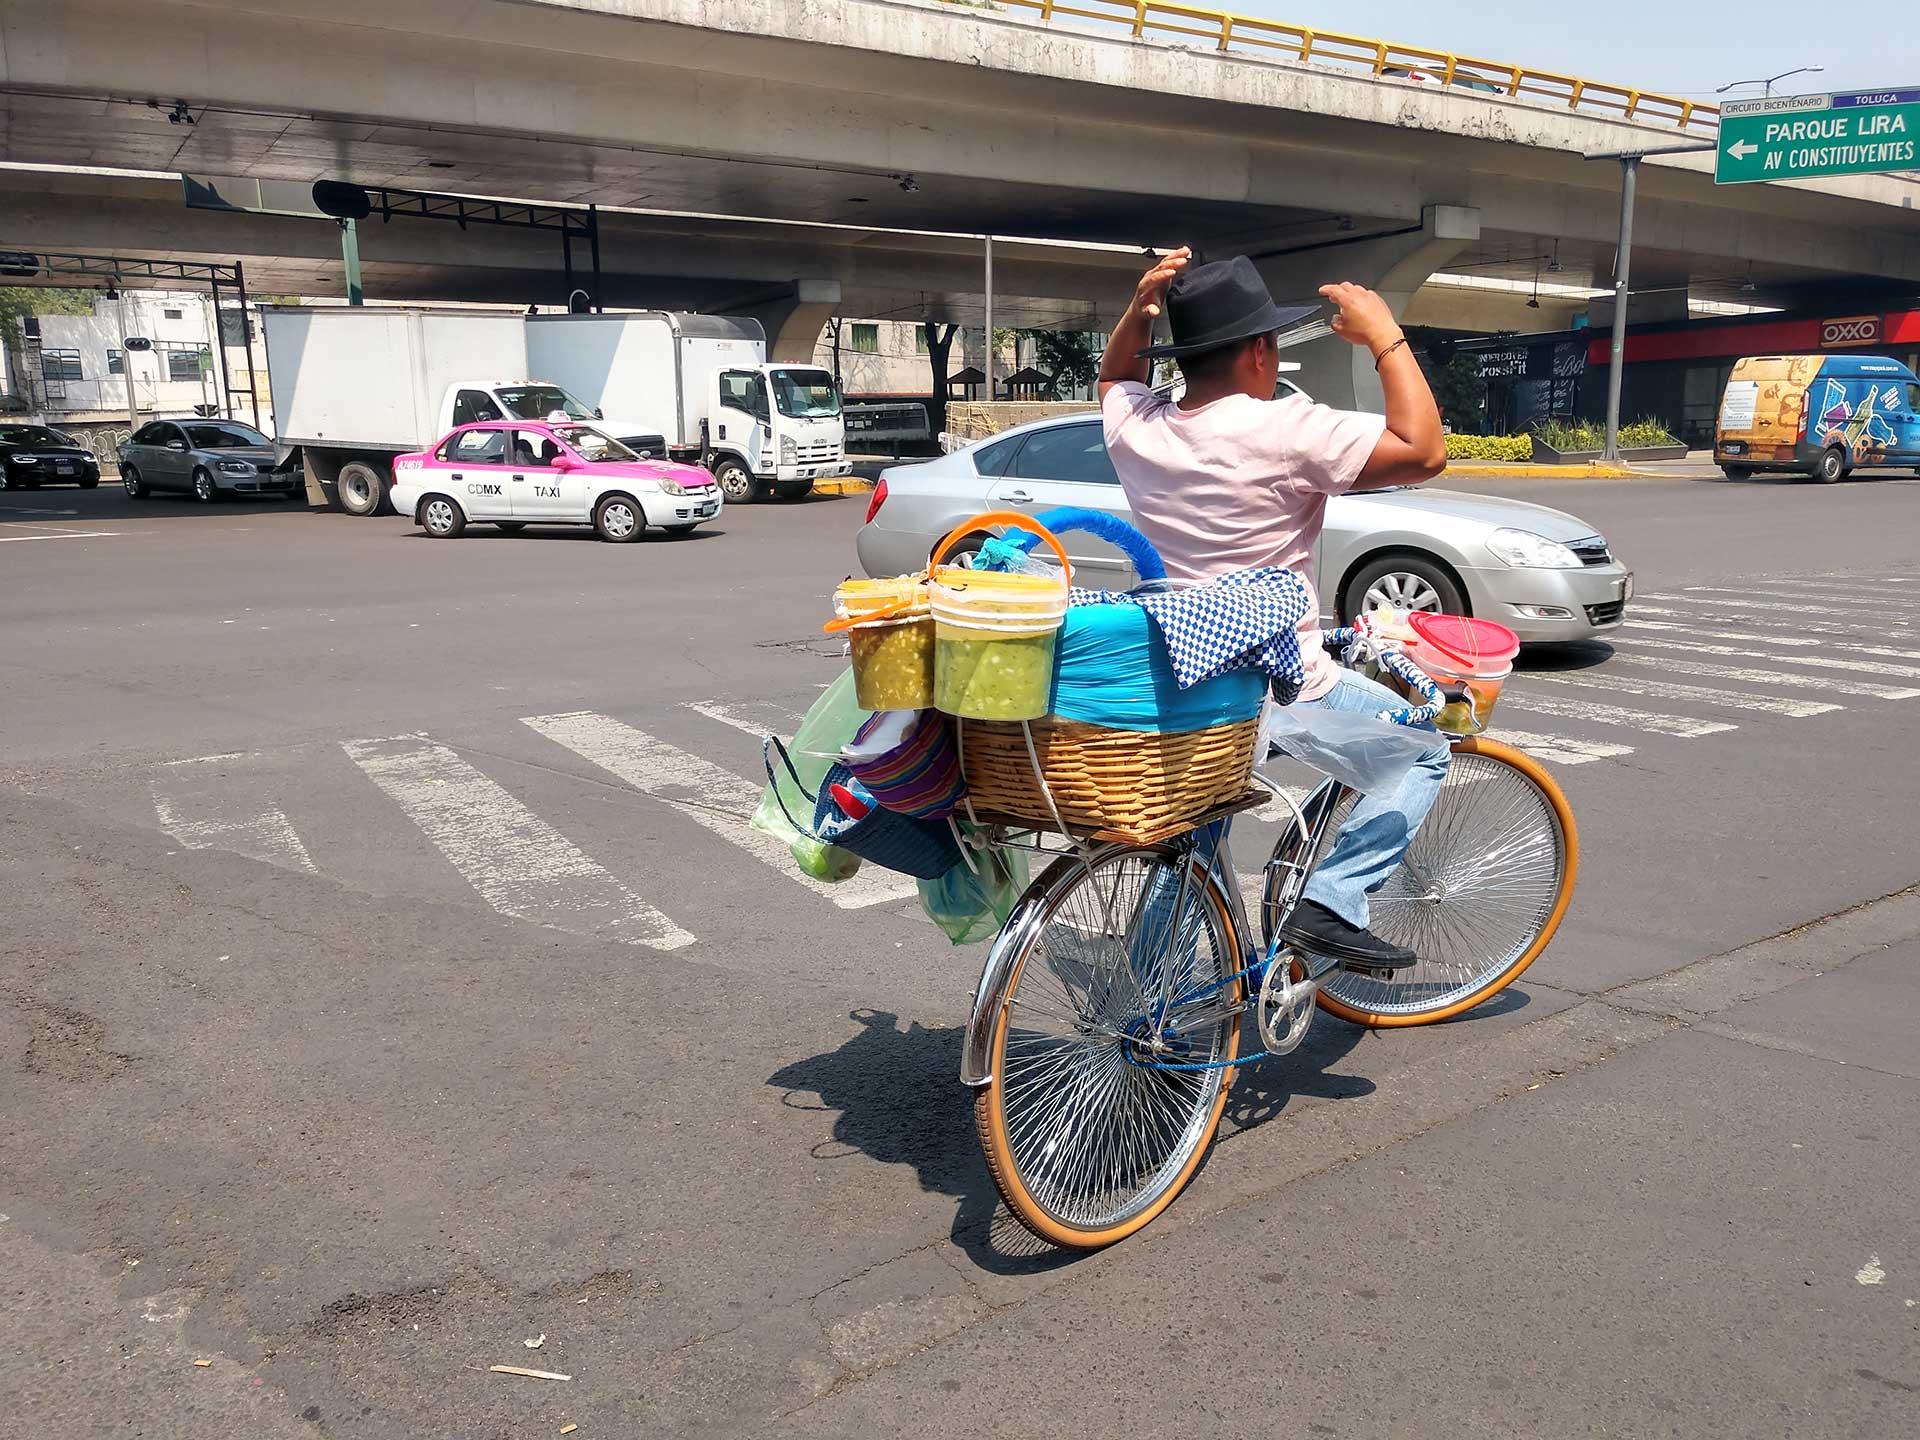 Bici tacos